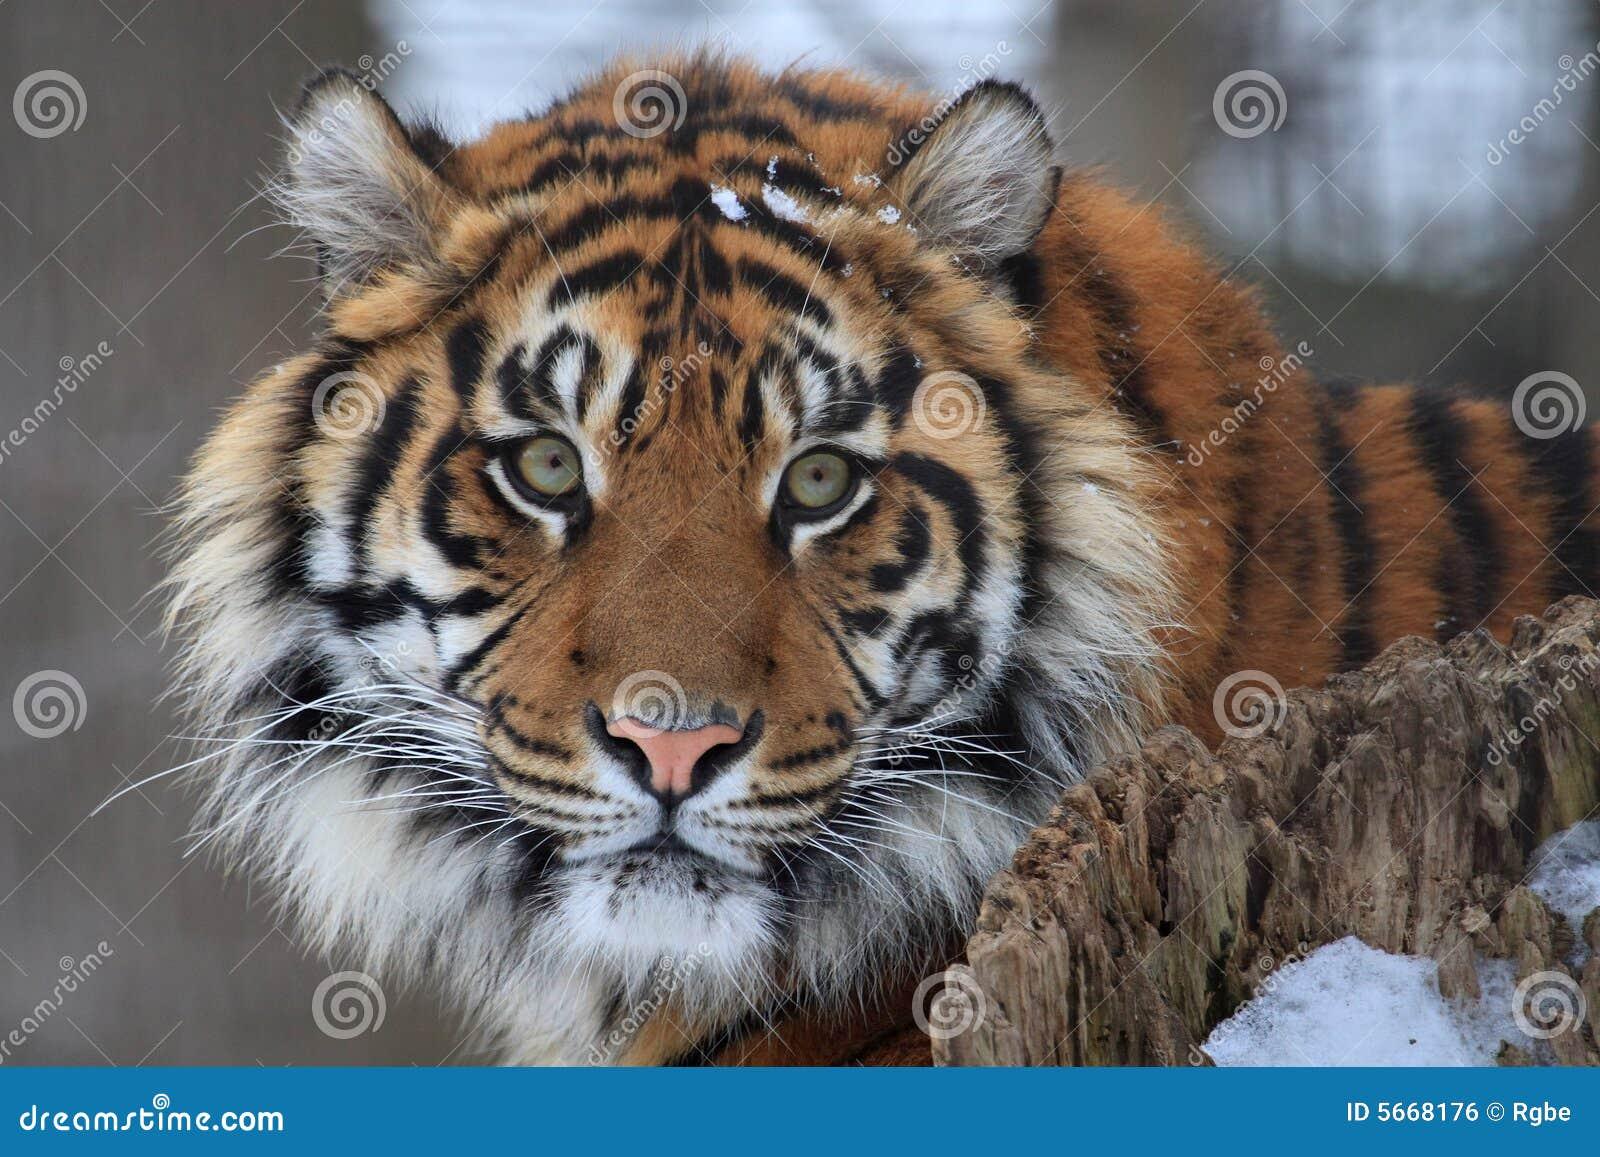 T te de tigre image libre de droits image 5668176 - Image tete de tigre ...